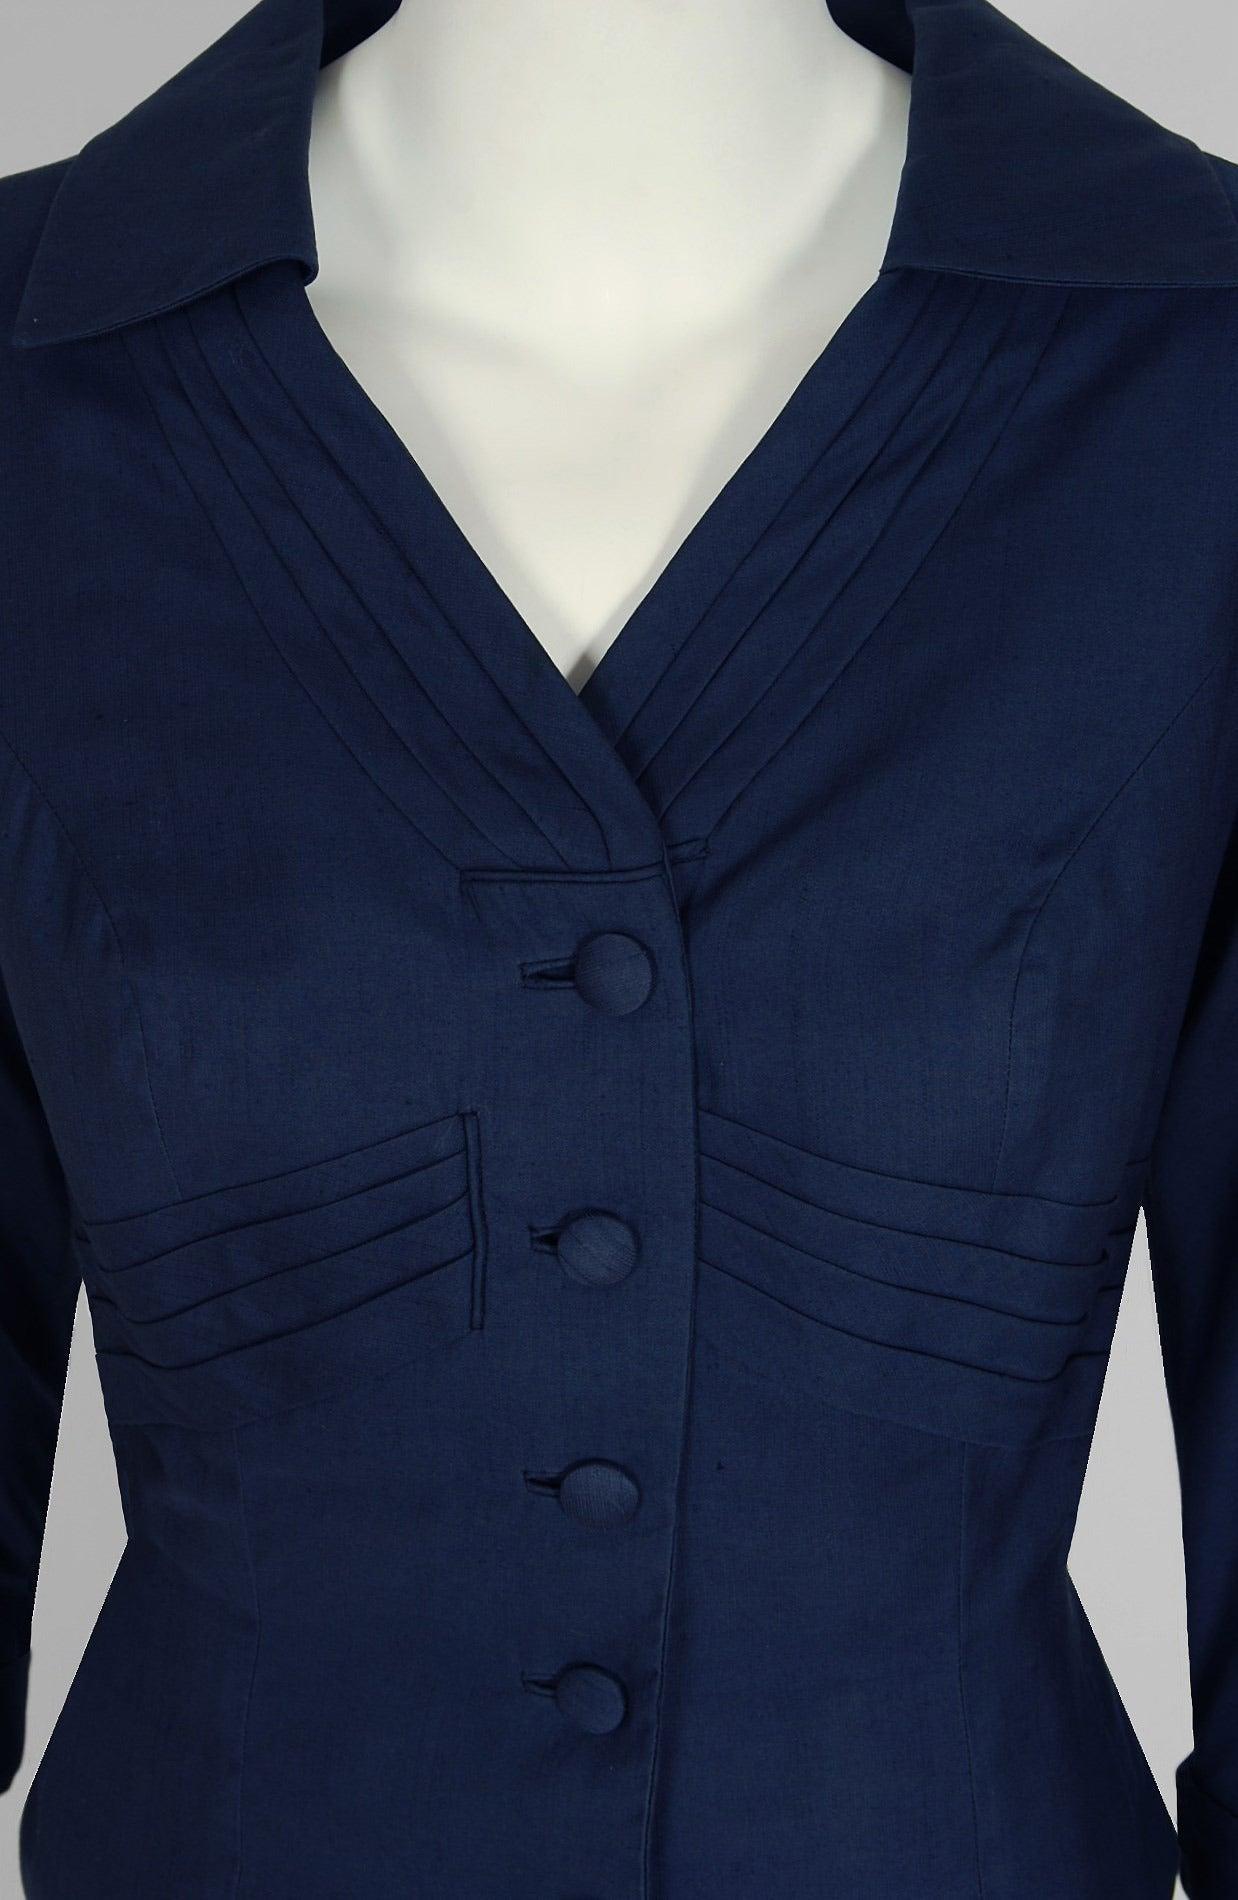 1940's Don Loper Navy-Blue Silk Tailored Hourglass Noir Pencil-Skirt Suit 3